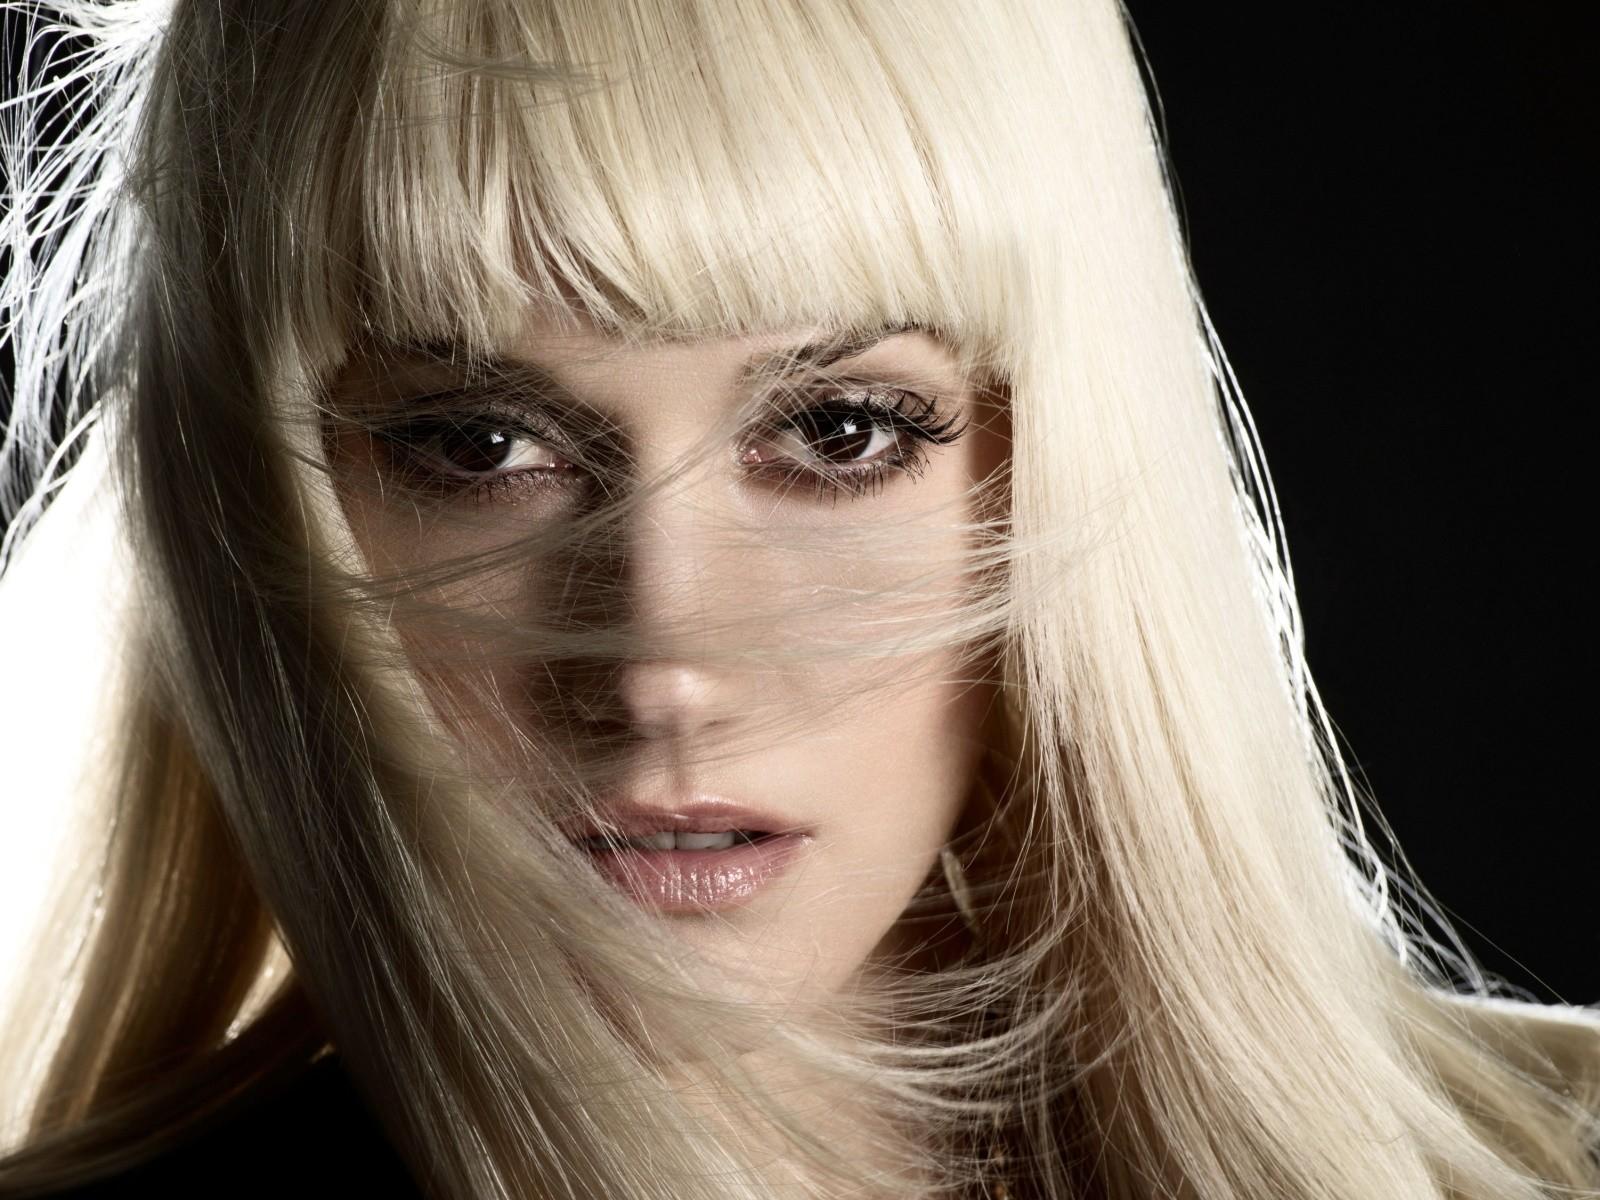 Gwen Stefani Says She Wrote Make Me Like You About Blake Shelton